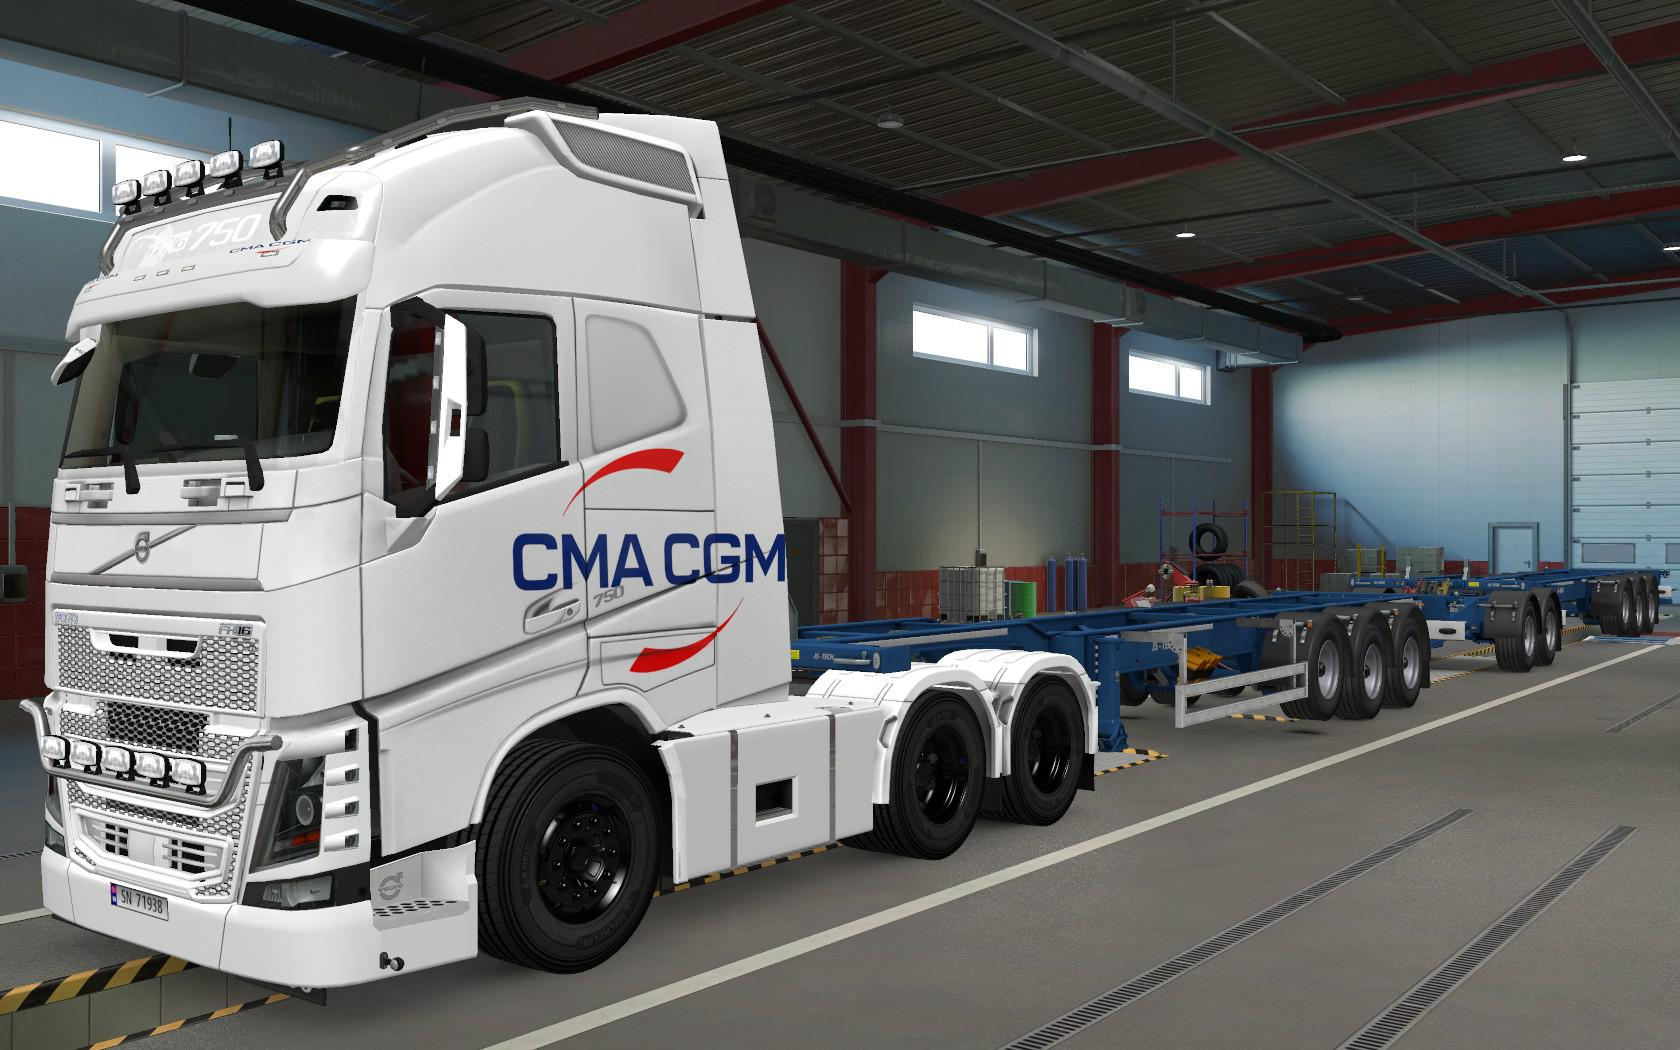 ETS2 - Volvo FH16 2012 CMA CGM White Skin (1.37.x)